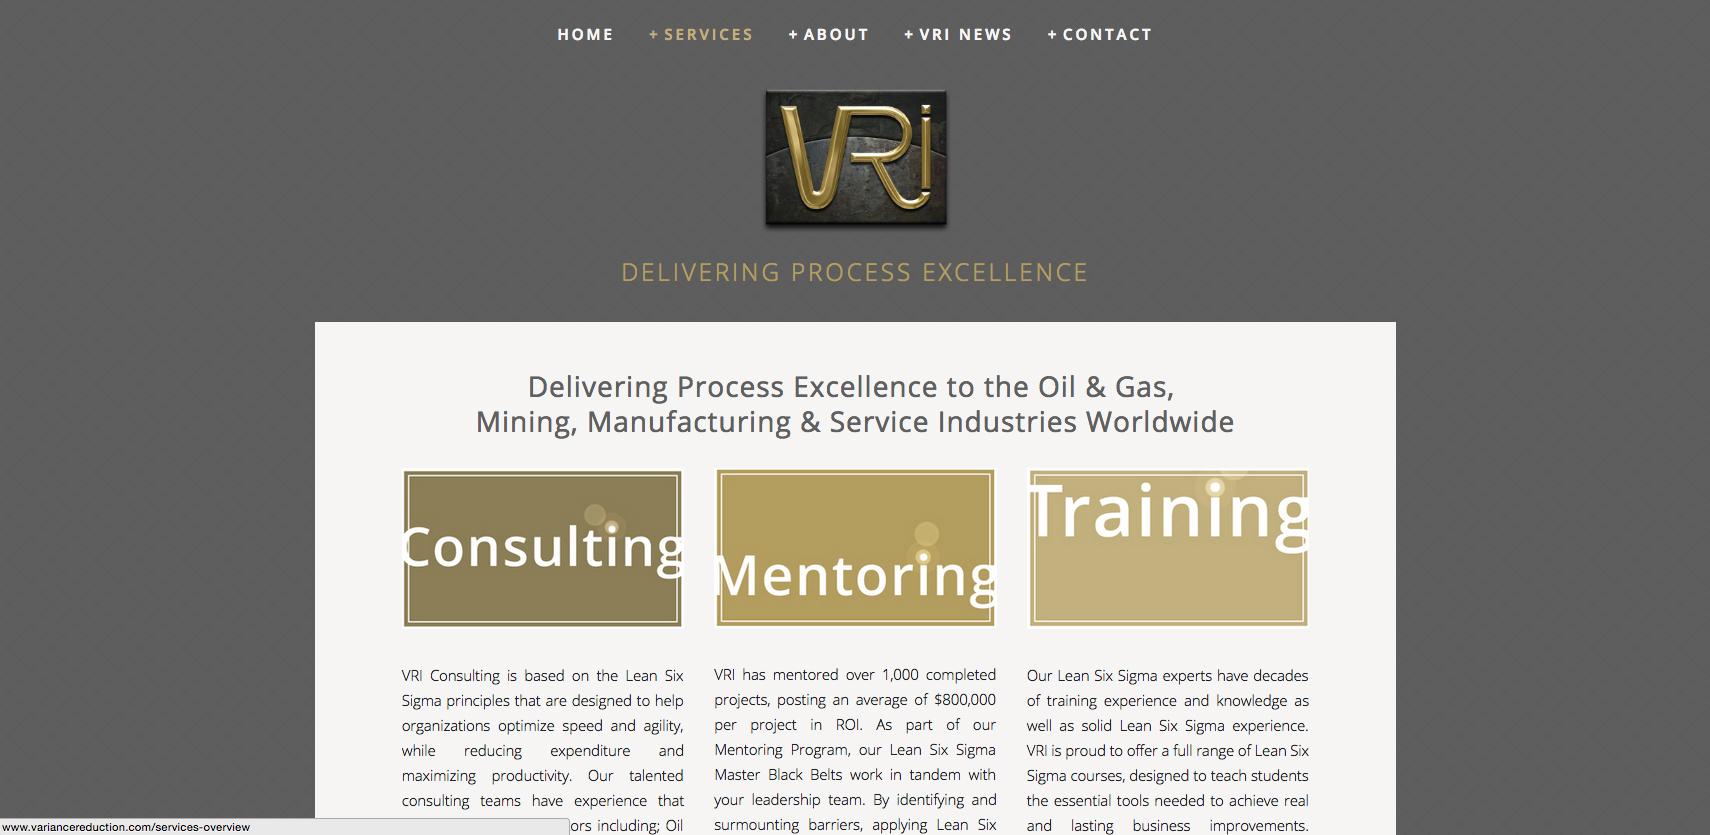 VRI Services Overview